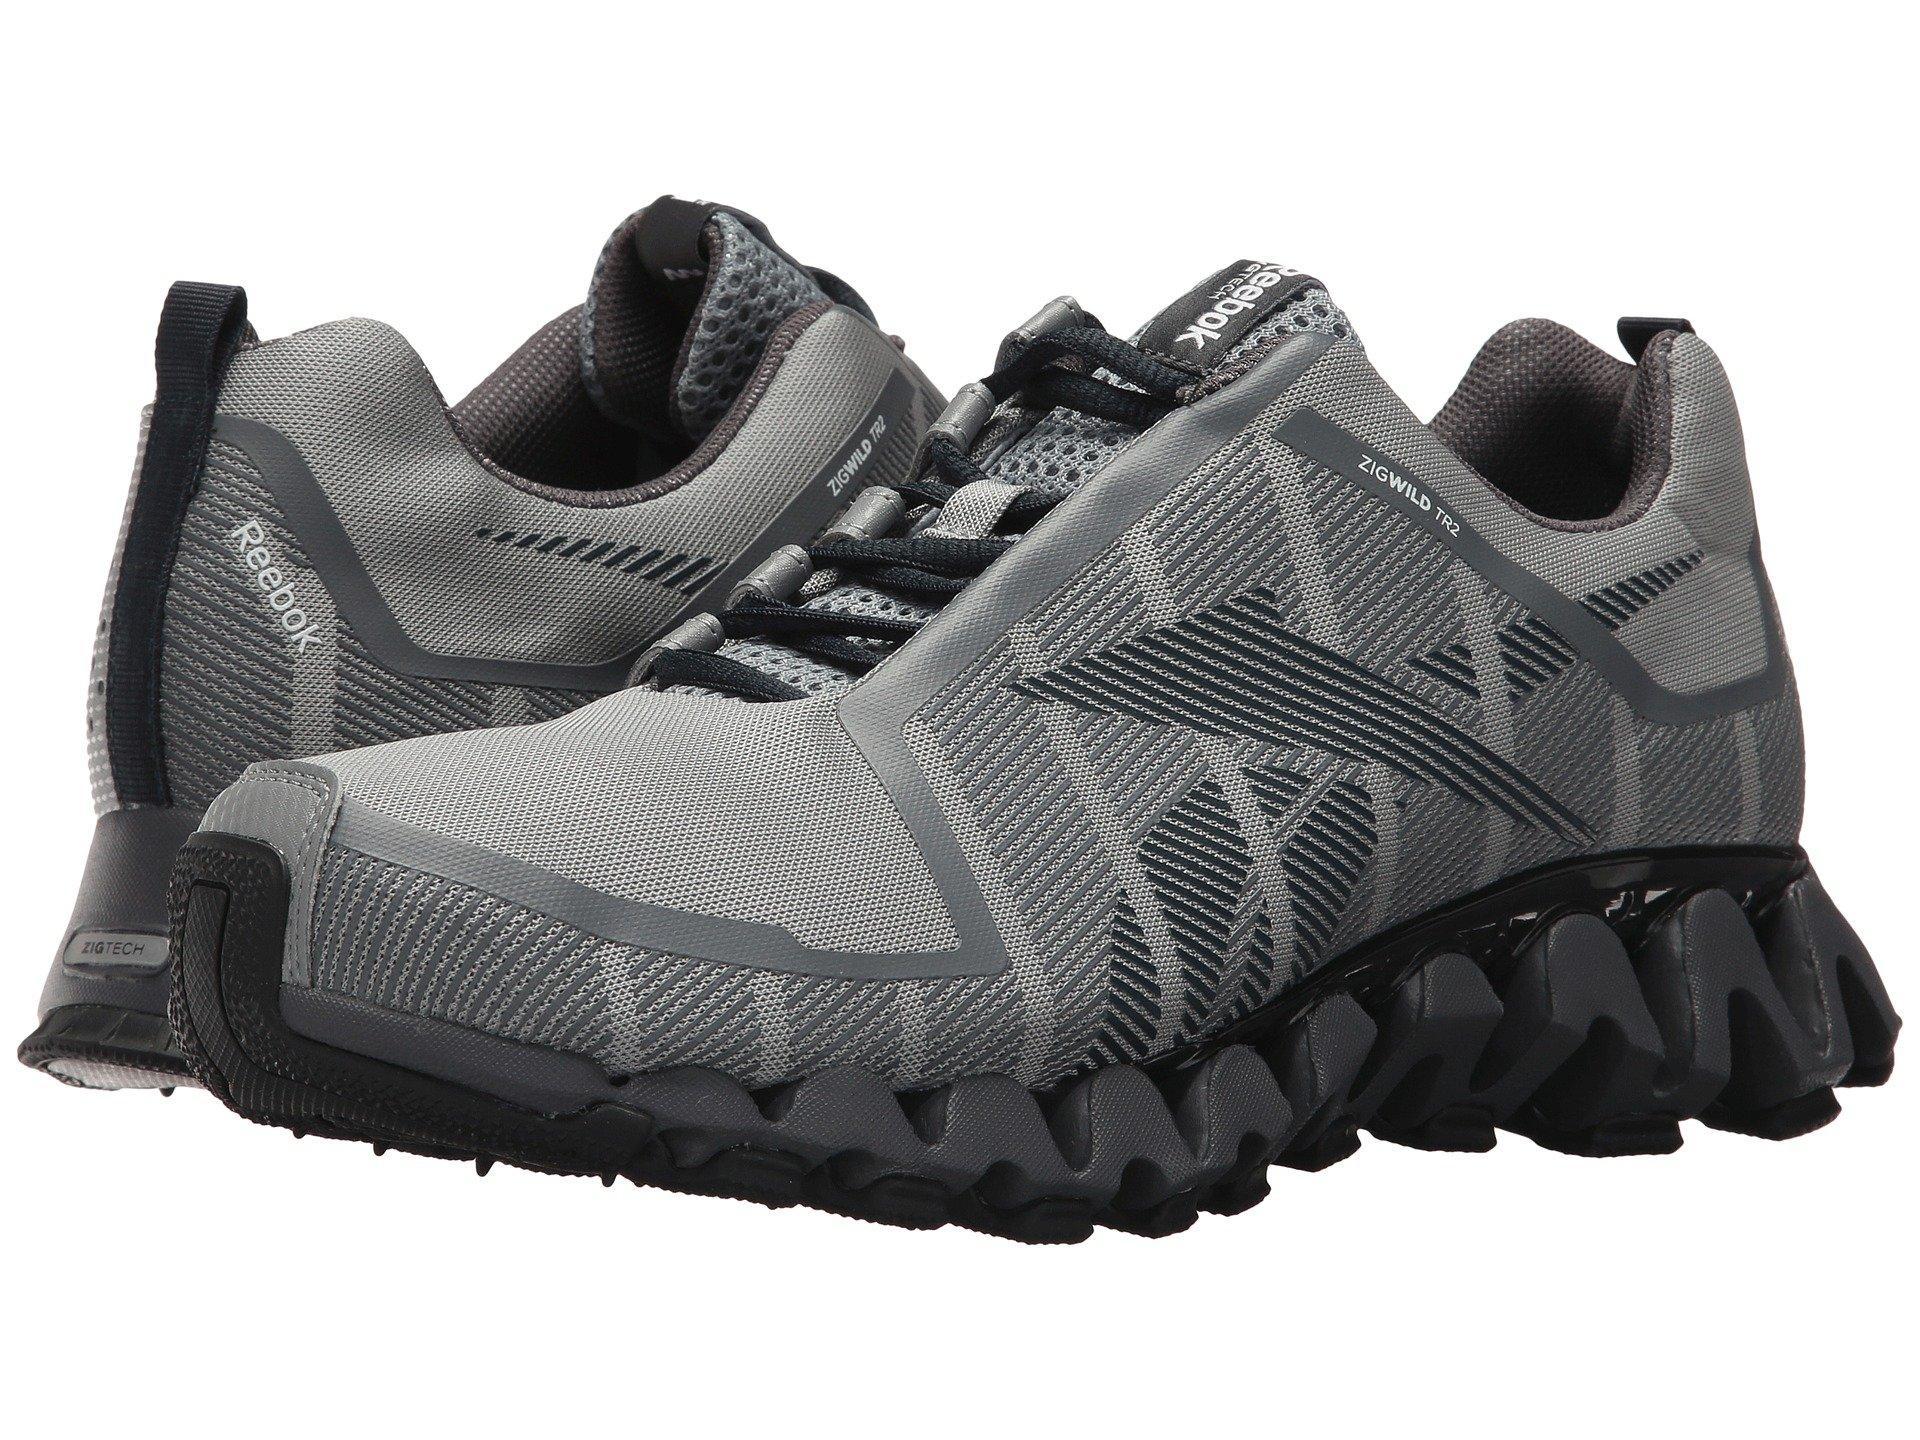 low priced 42454 4470a Reebok Zigwild Tr 2 In Flat Grey Ash Grey